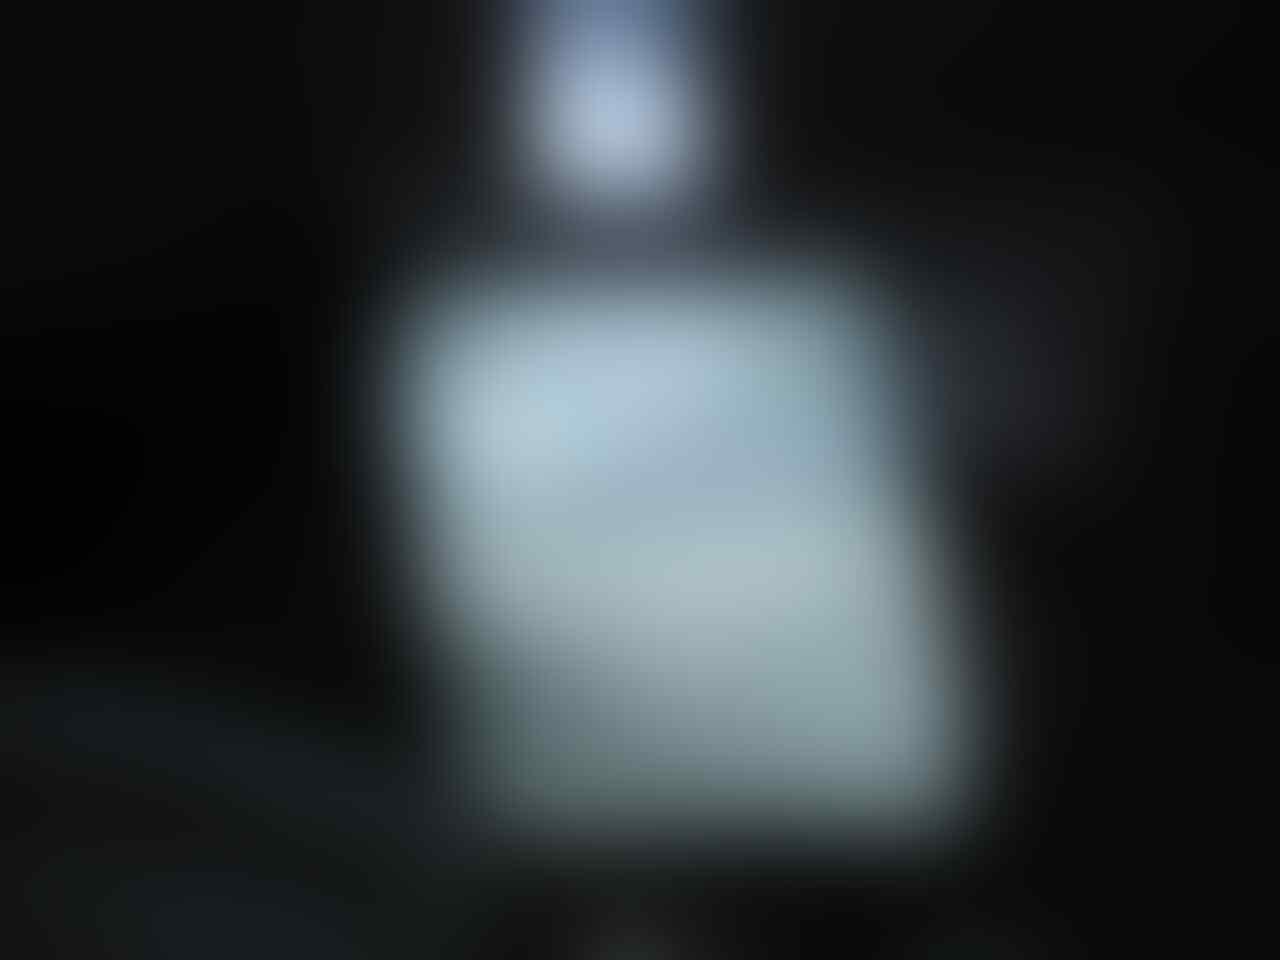 ★★★ JACKET VARSITY NIKE SPORTSWEAR CLASSIC FALL AND WINTER 2009 ★★★